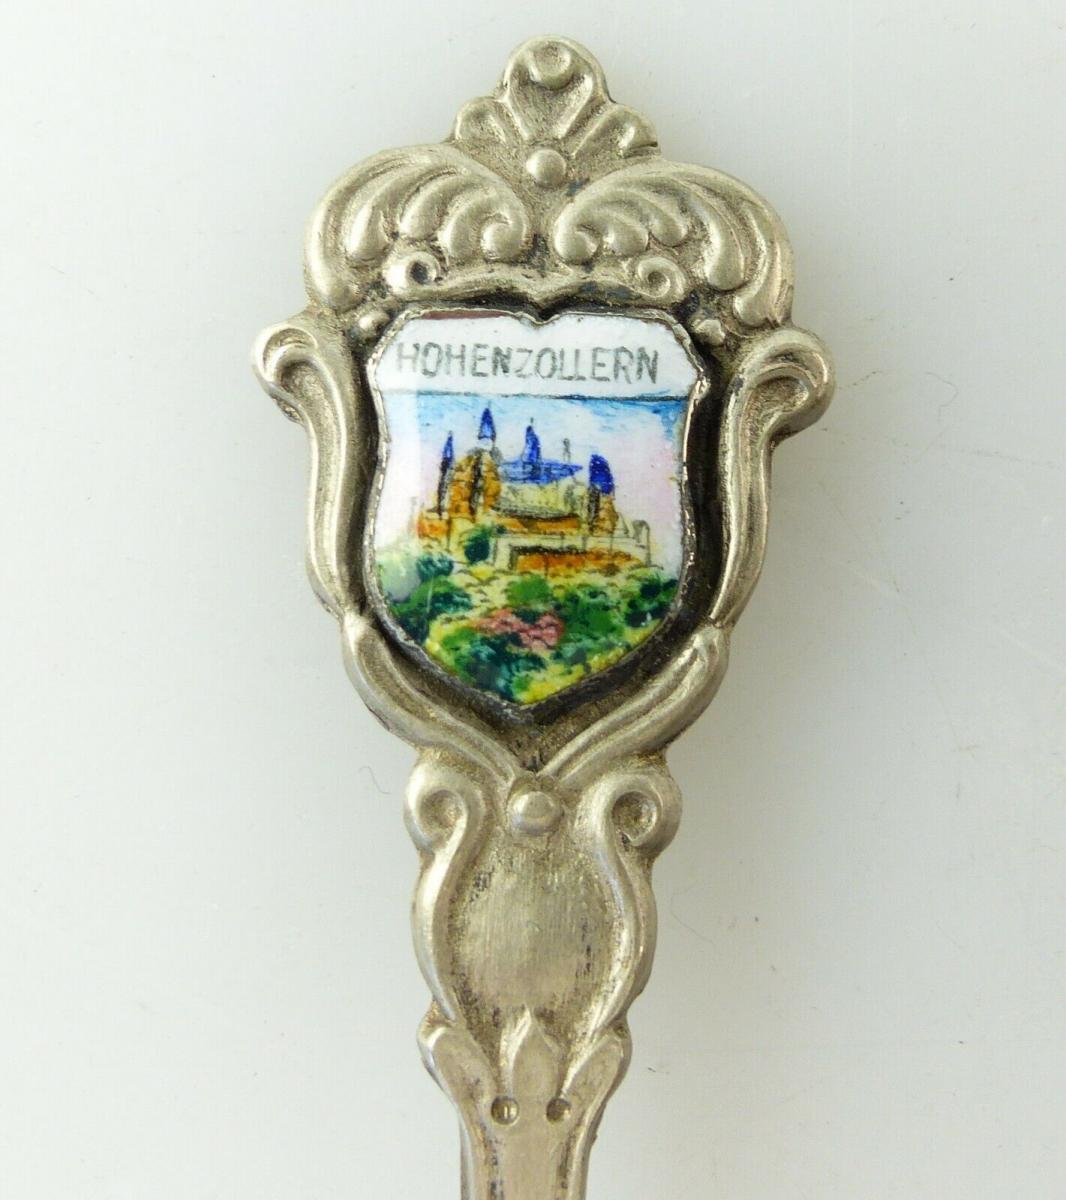 E10520 Alter Wappenlöffel aus 800 Silber Hohenzollern 1